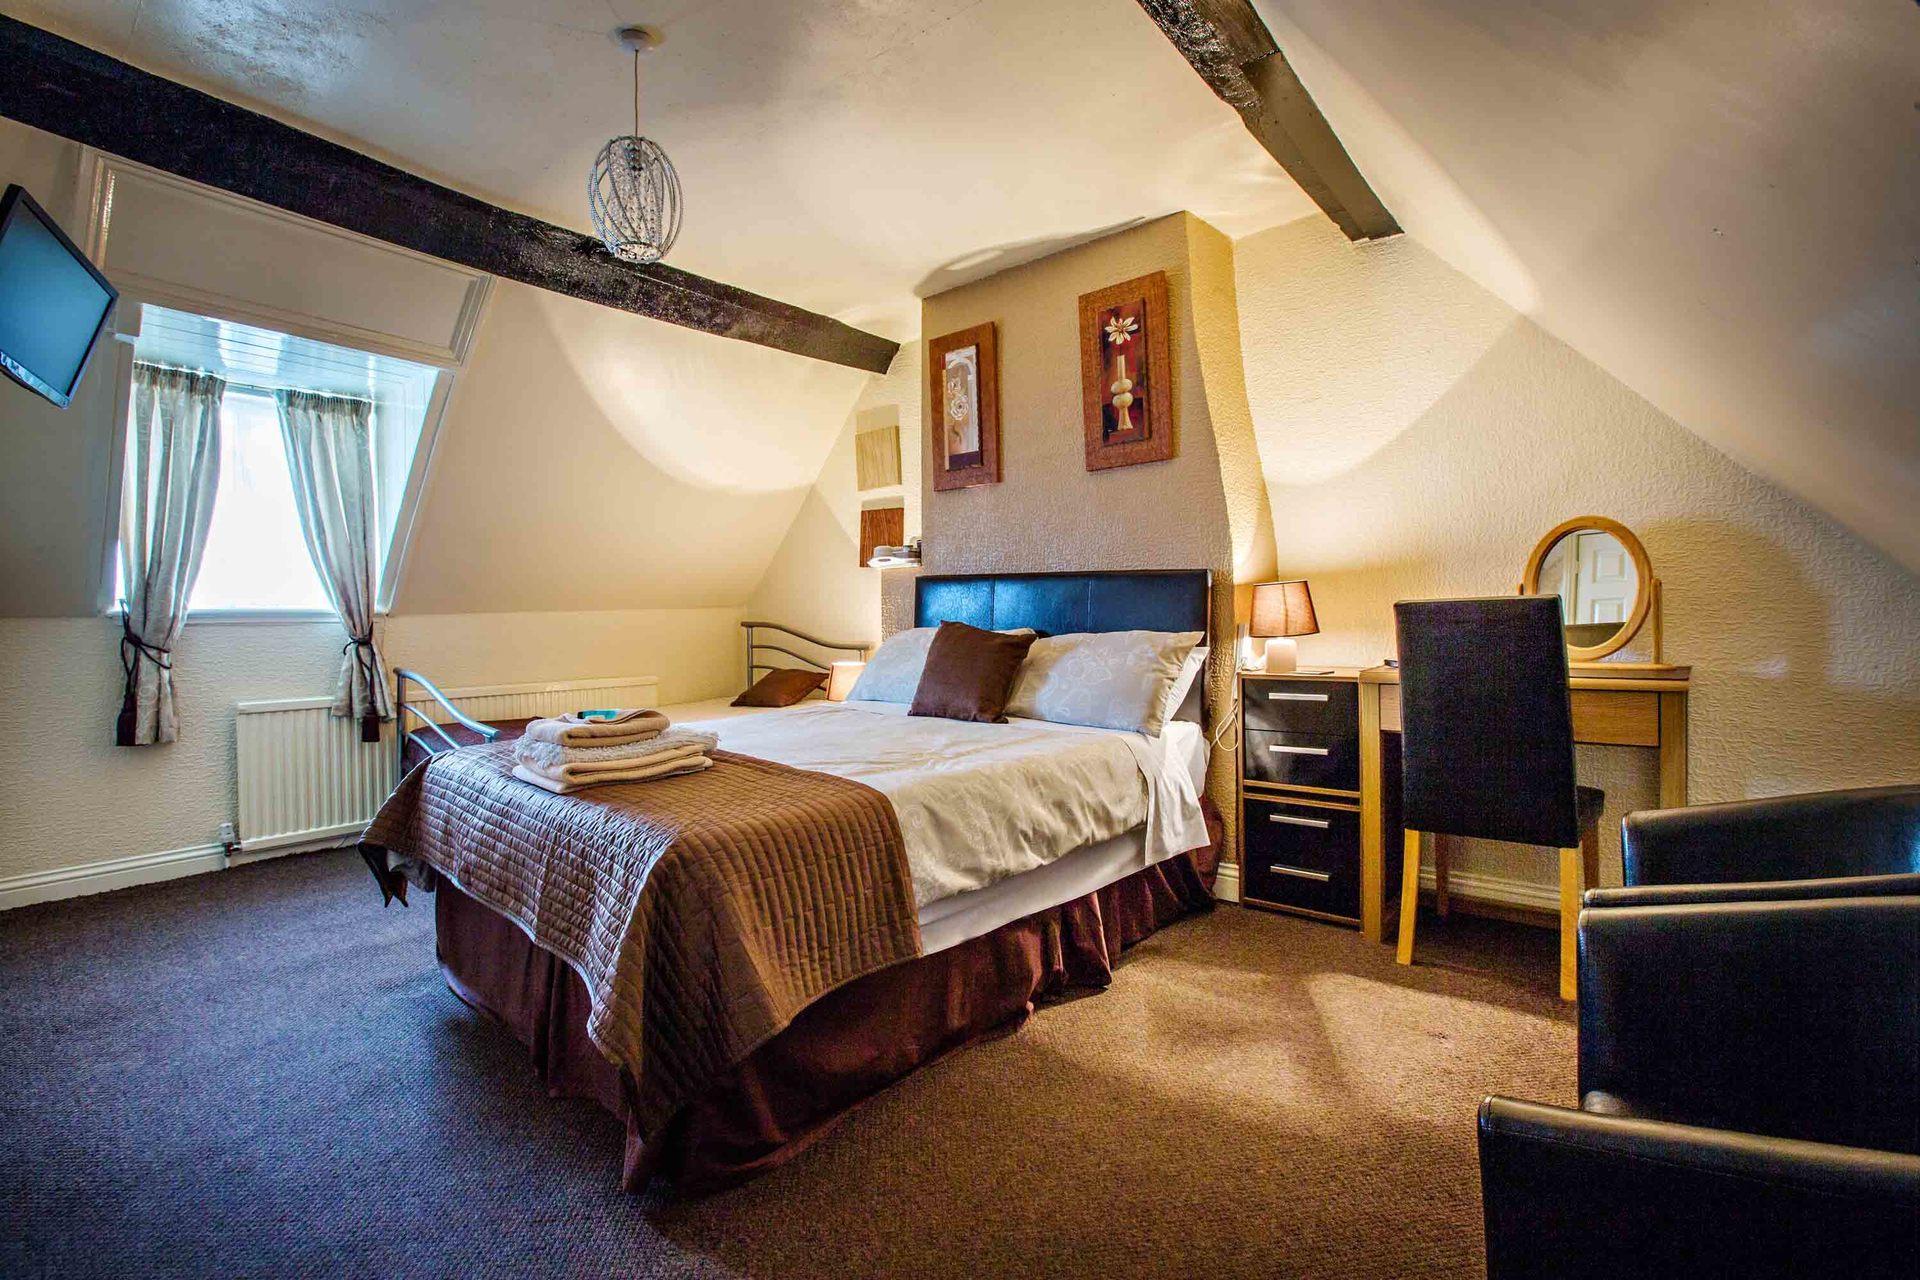 generous bedroom with eves